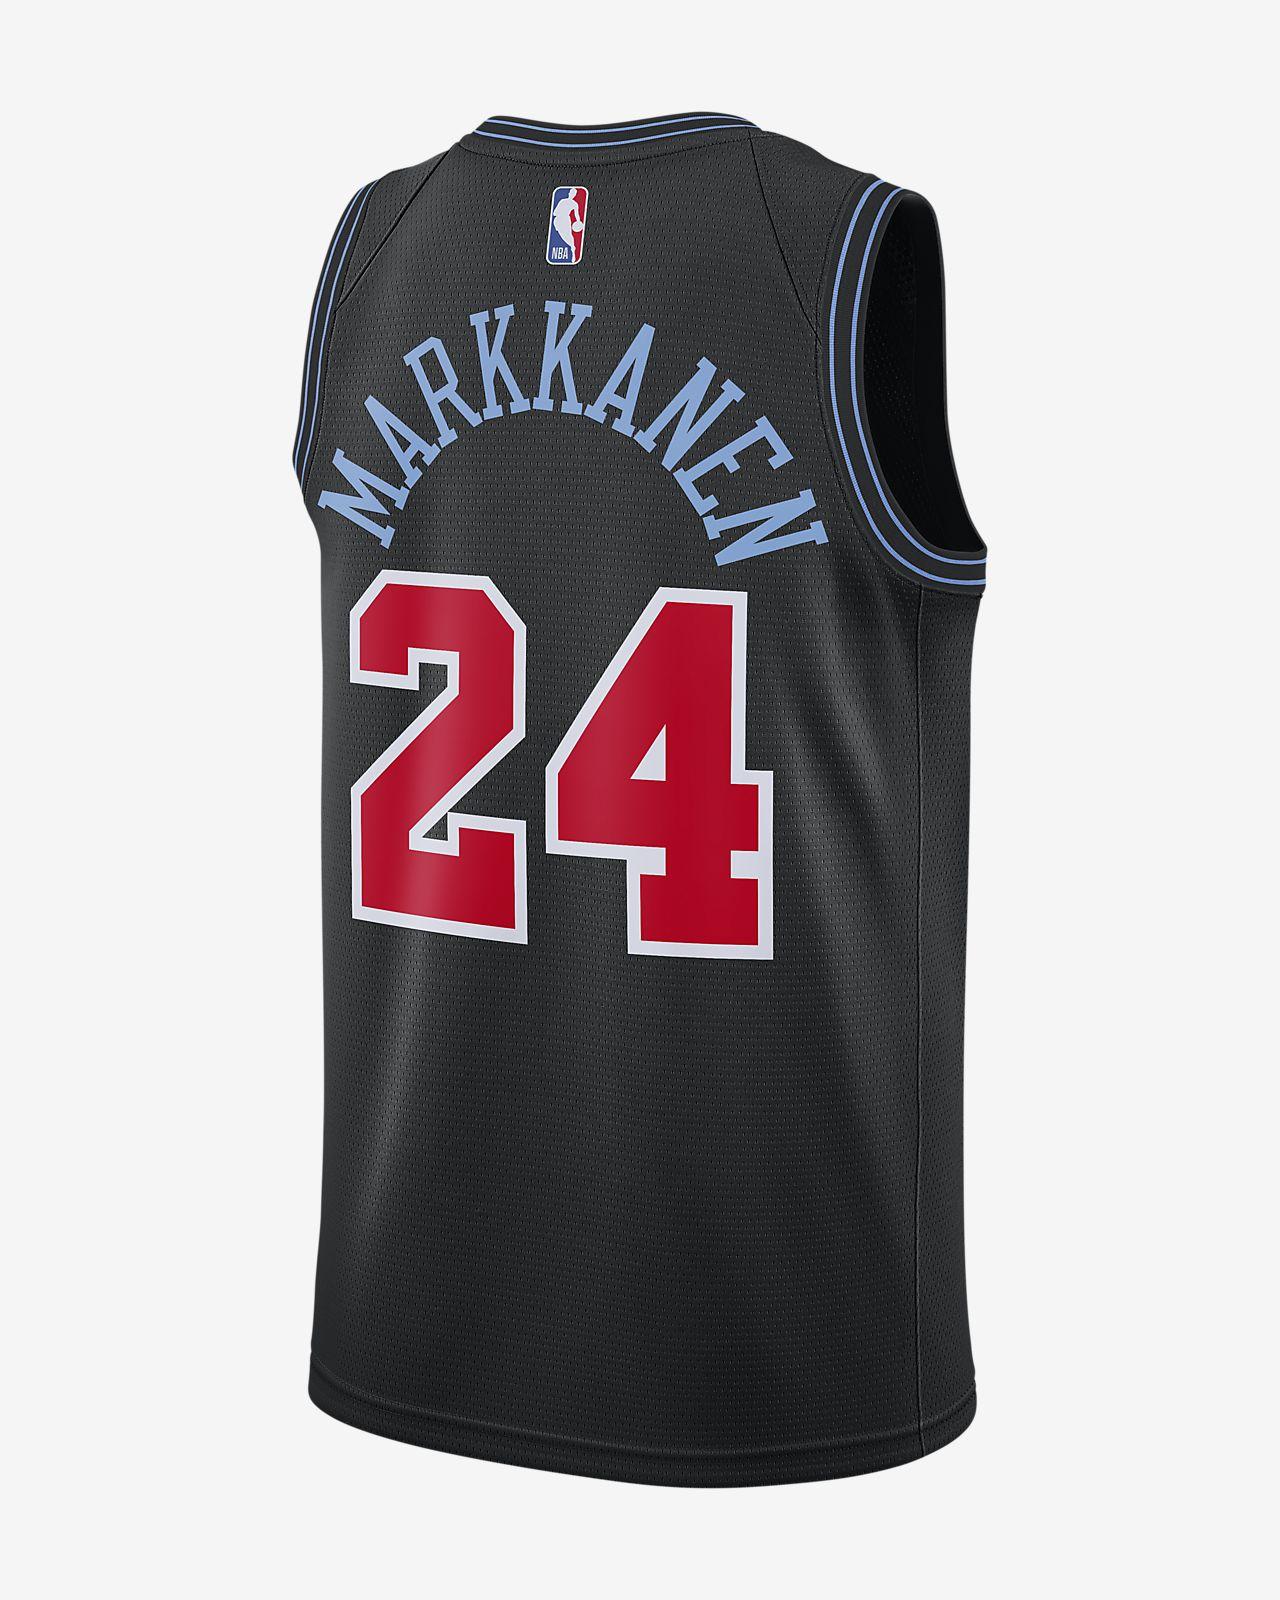 26656e37d ... Lauri Markkanen City Edition Swingman (Chicago Bulls) Men s Nike NBA  Connected Jersey